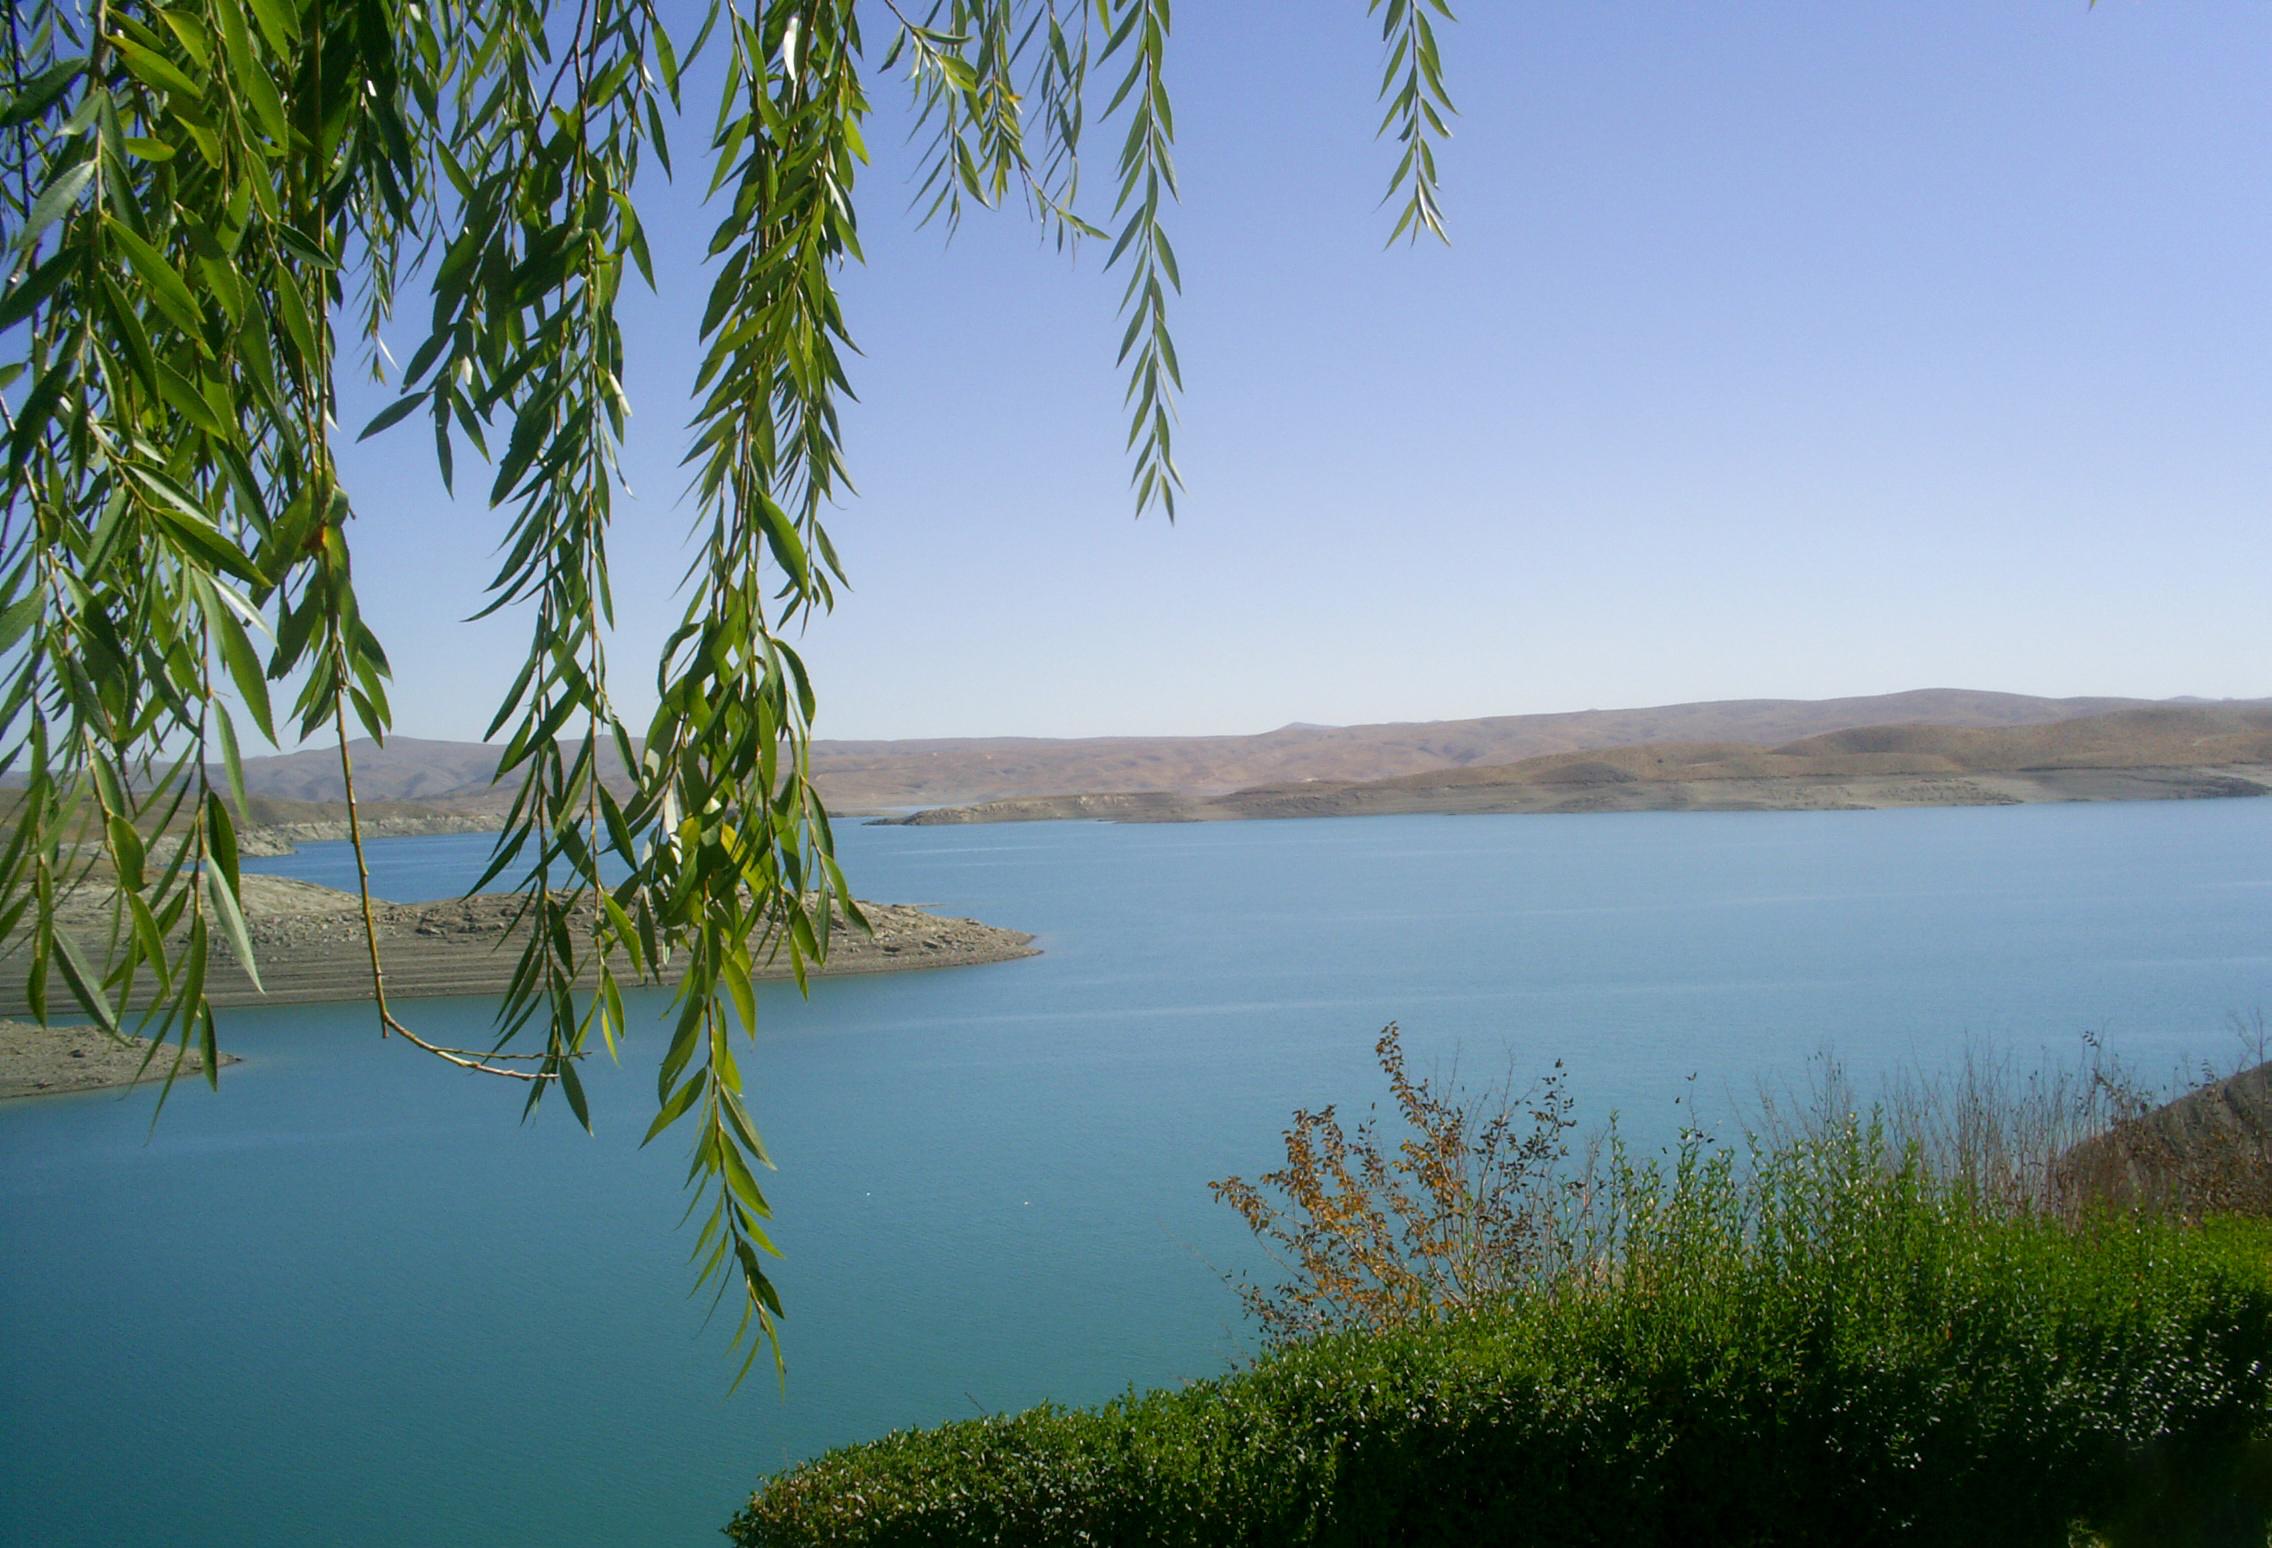 دریاچه سد چادگان